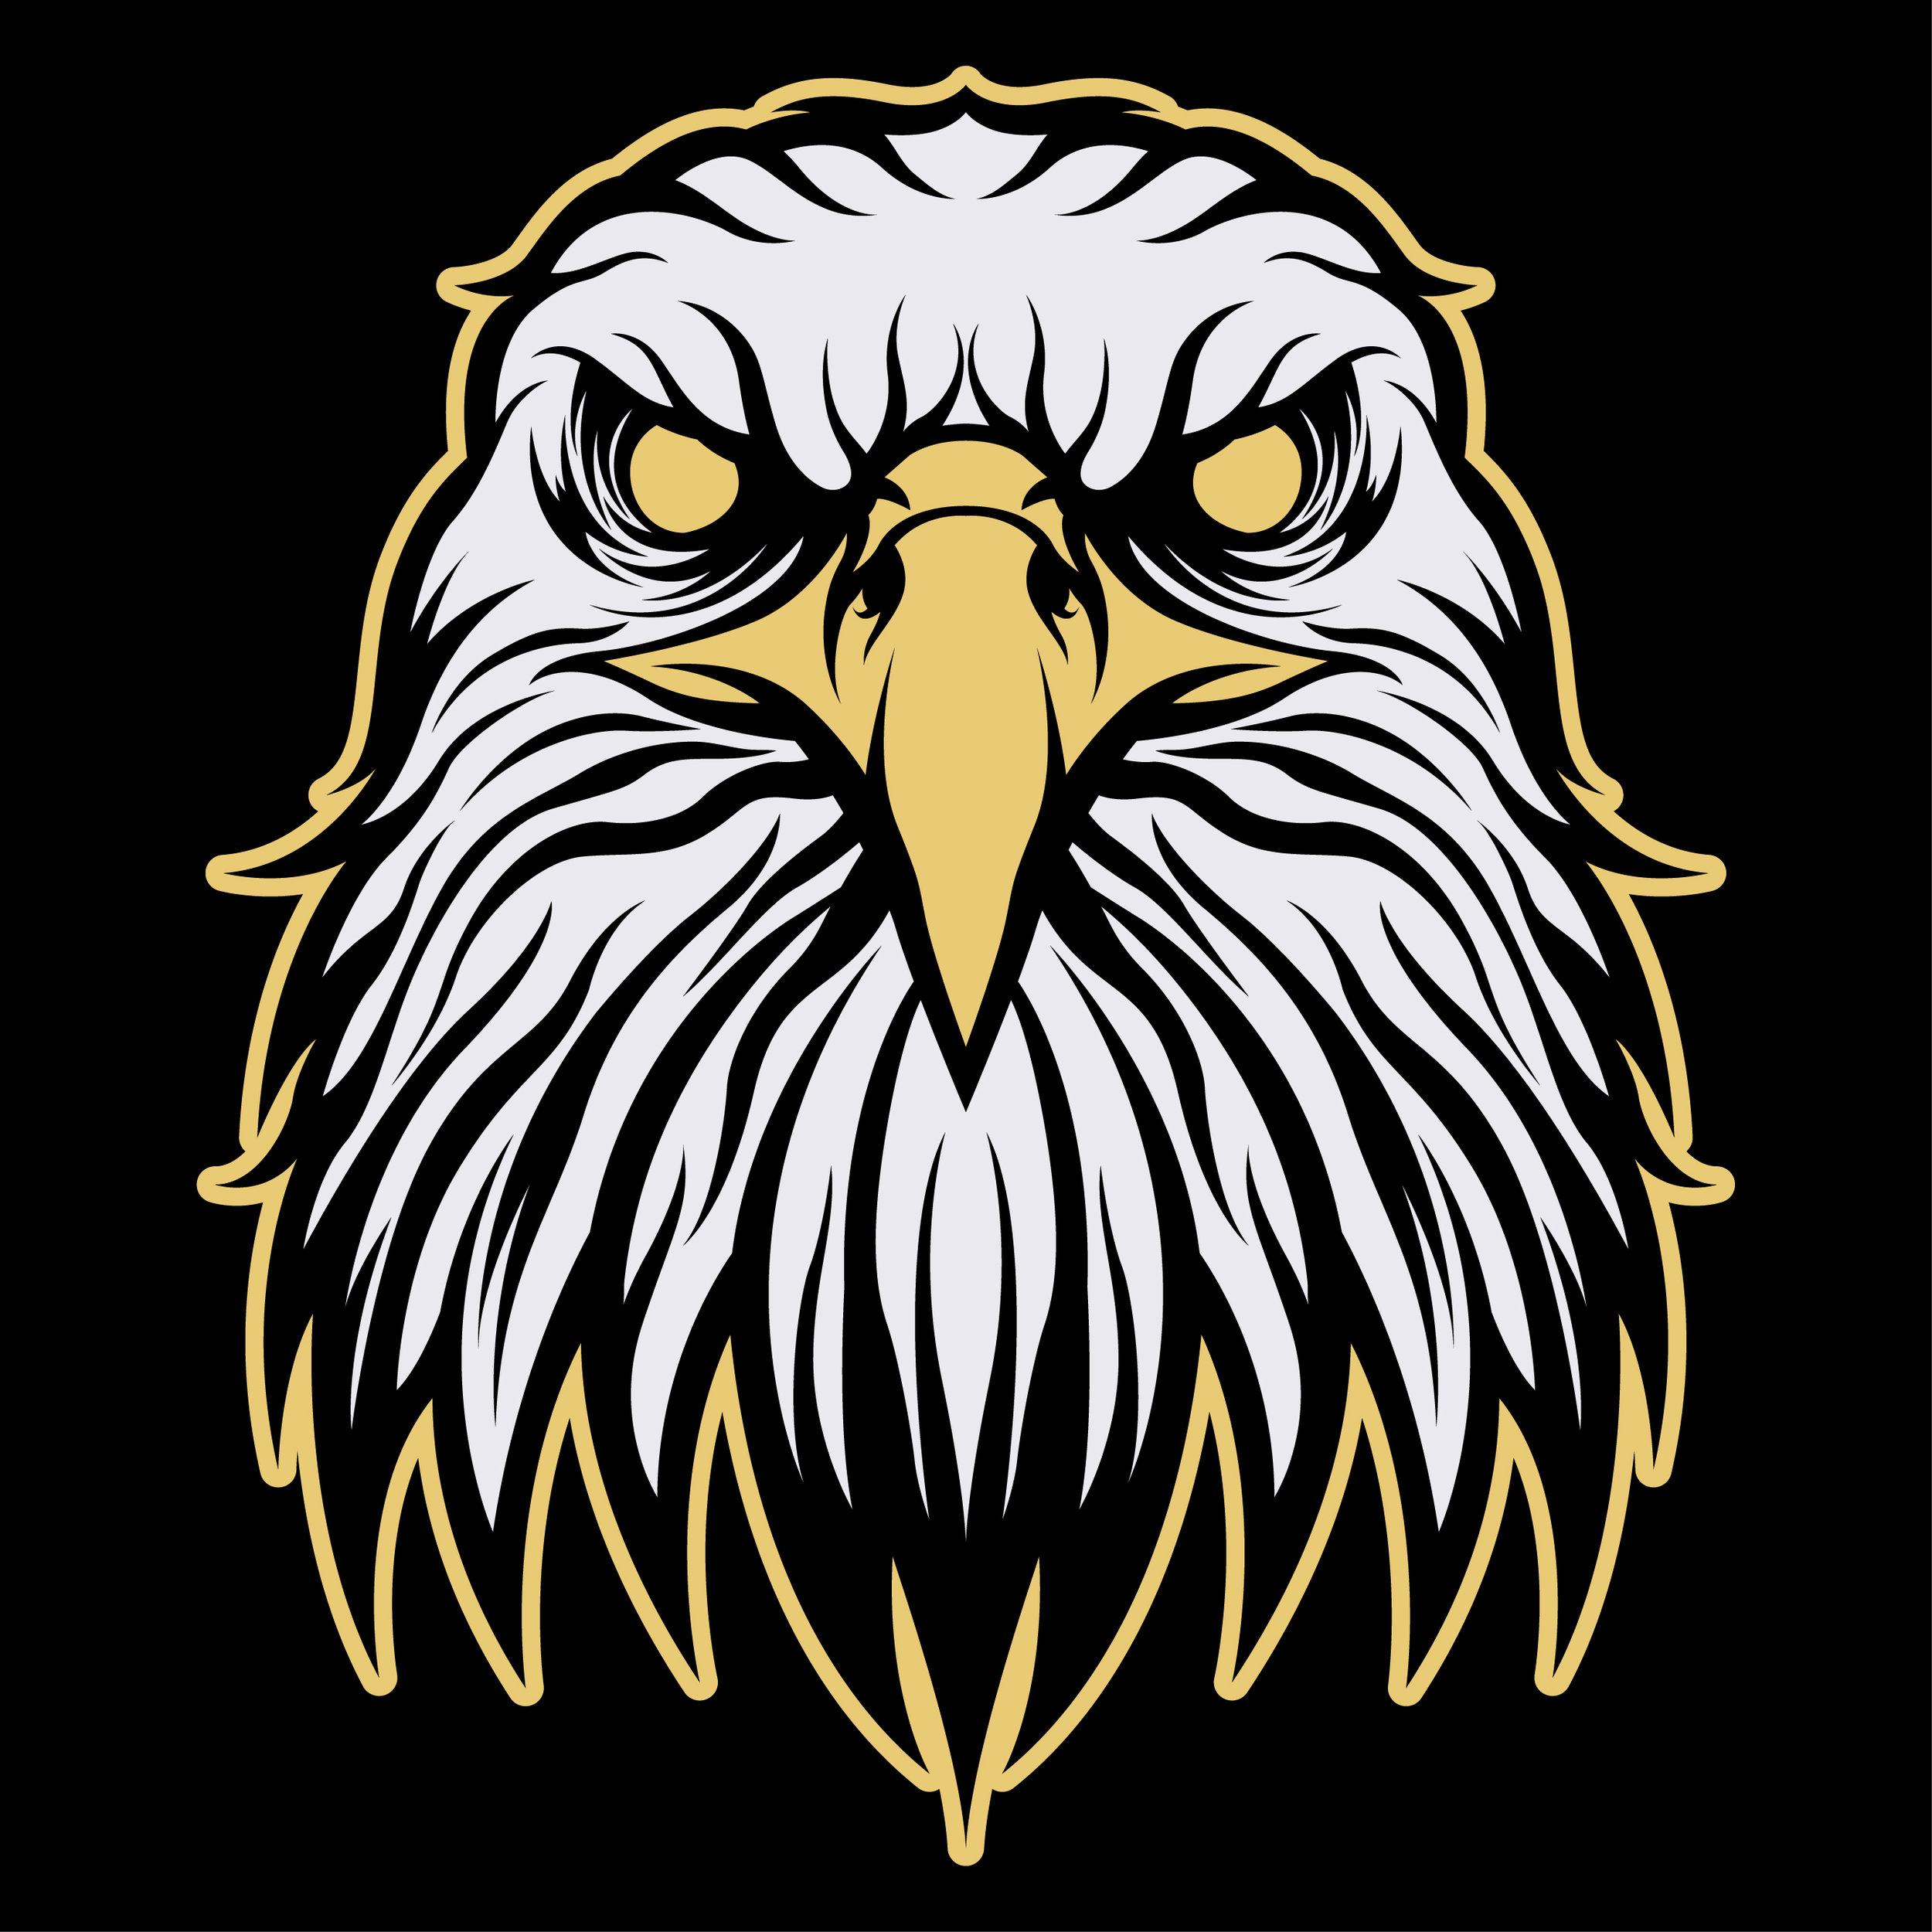 orozcodesign-keywaydesigns-eagle-illustration.jpg